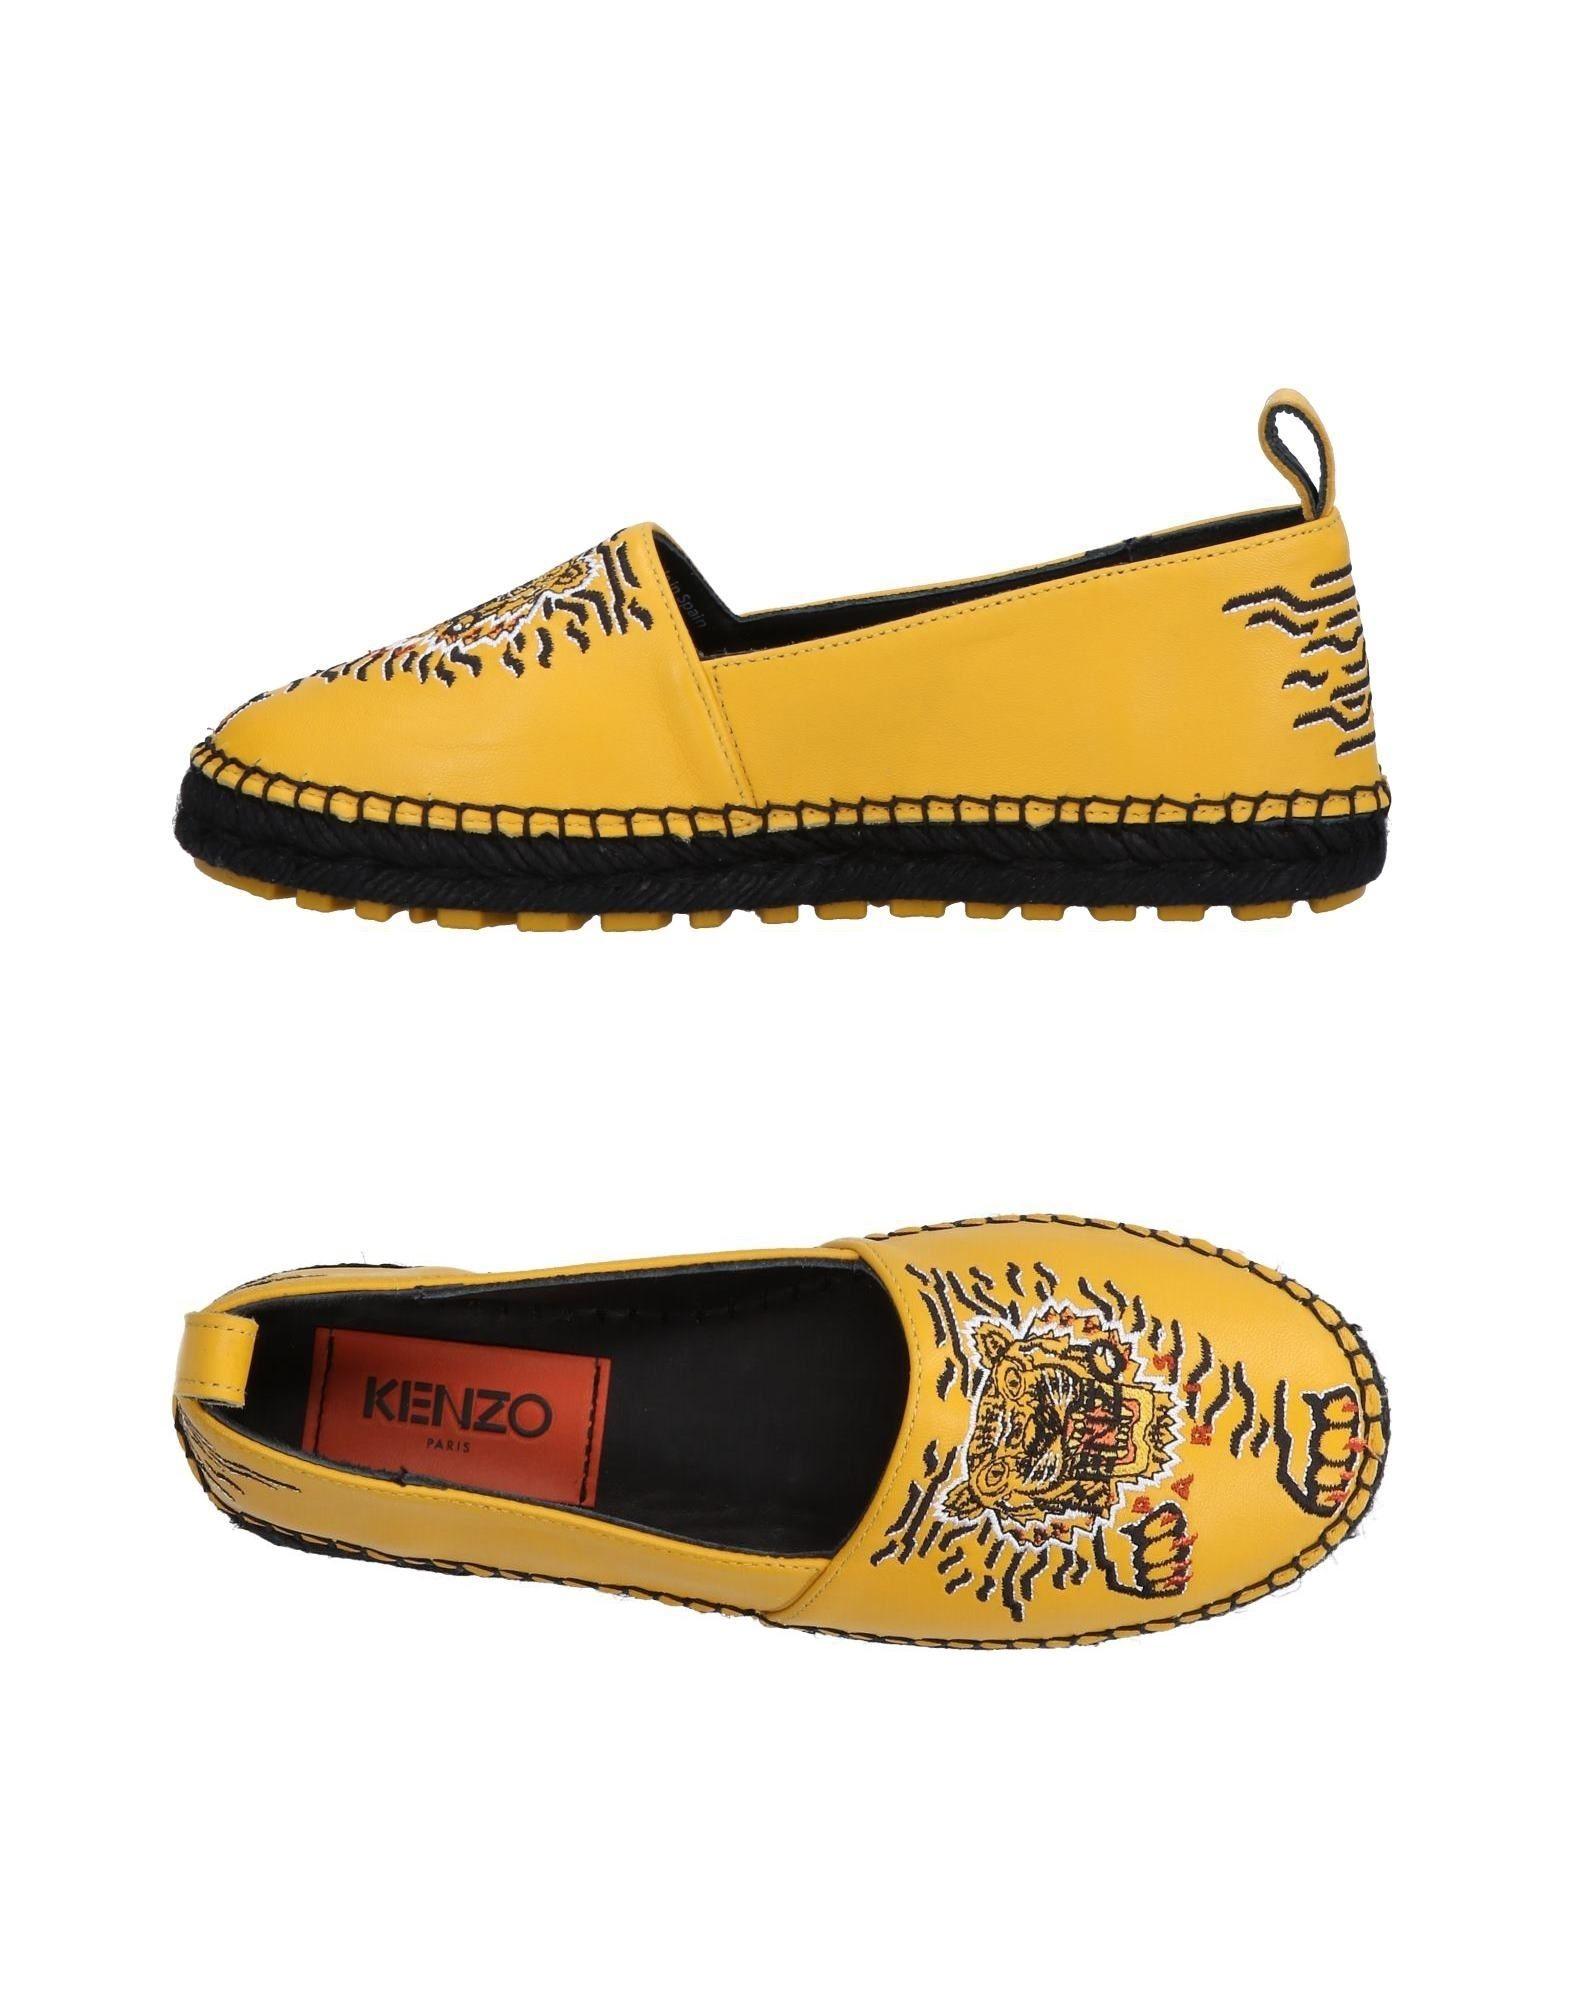 Stilvolle Damen billige Schuhe Kenzo Espadrilles Damen Stilvolle  11459838NR f17738